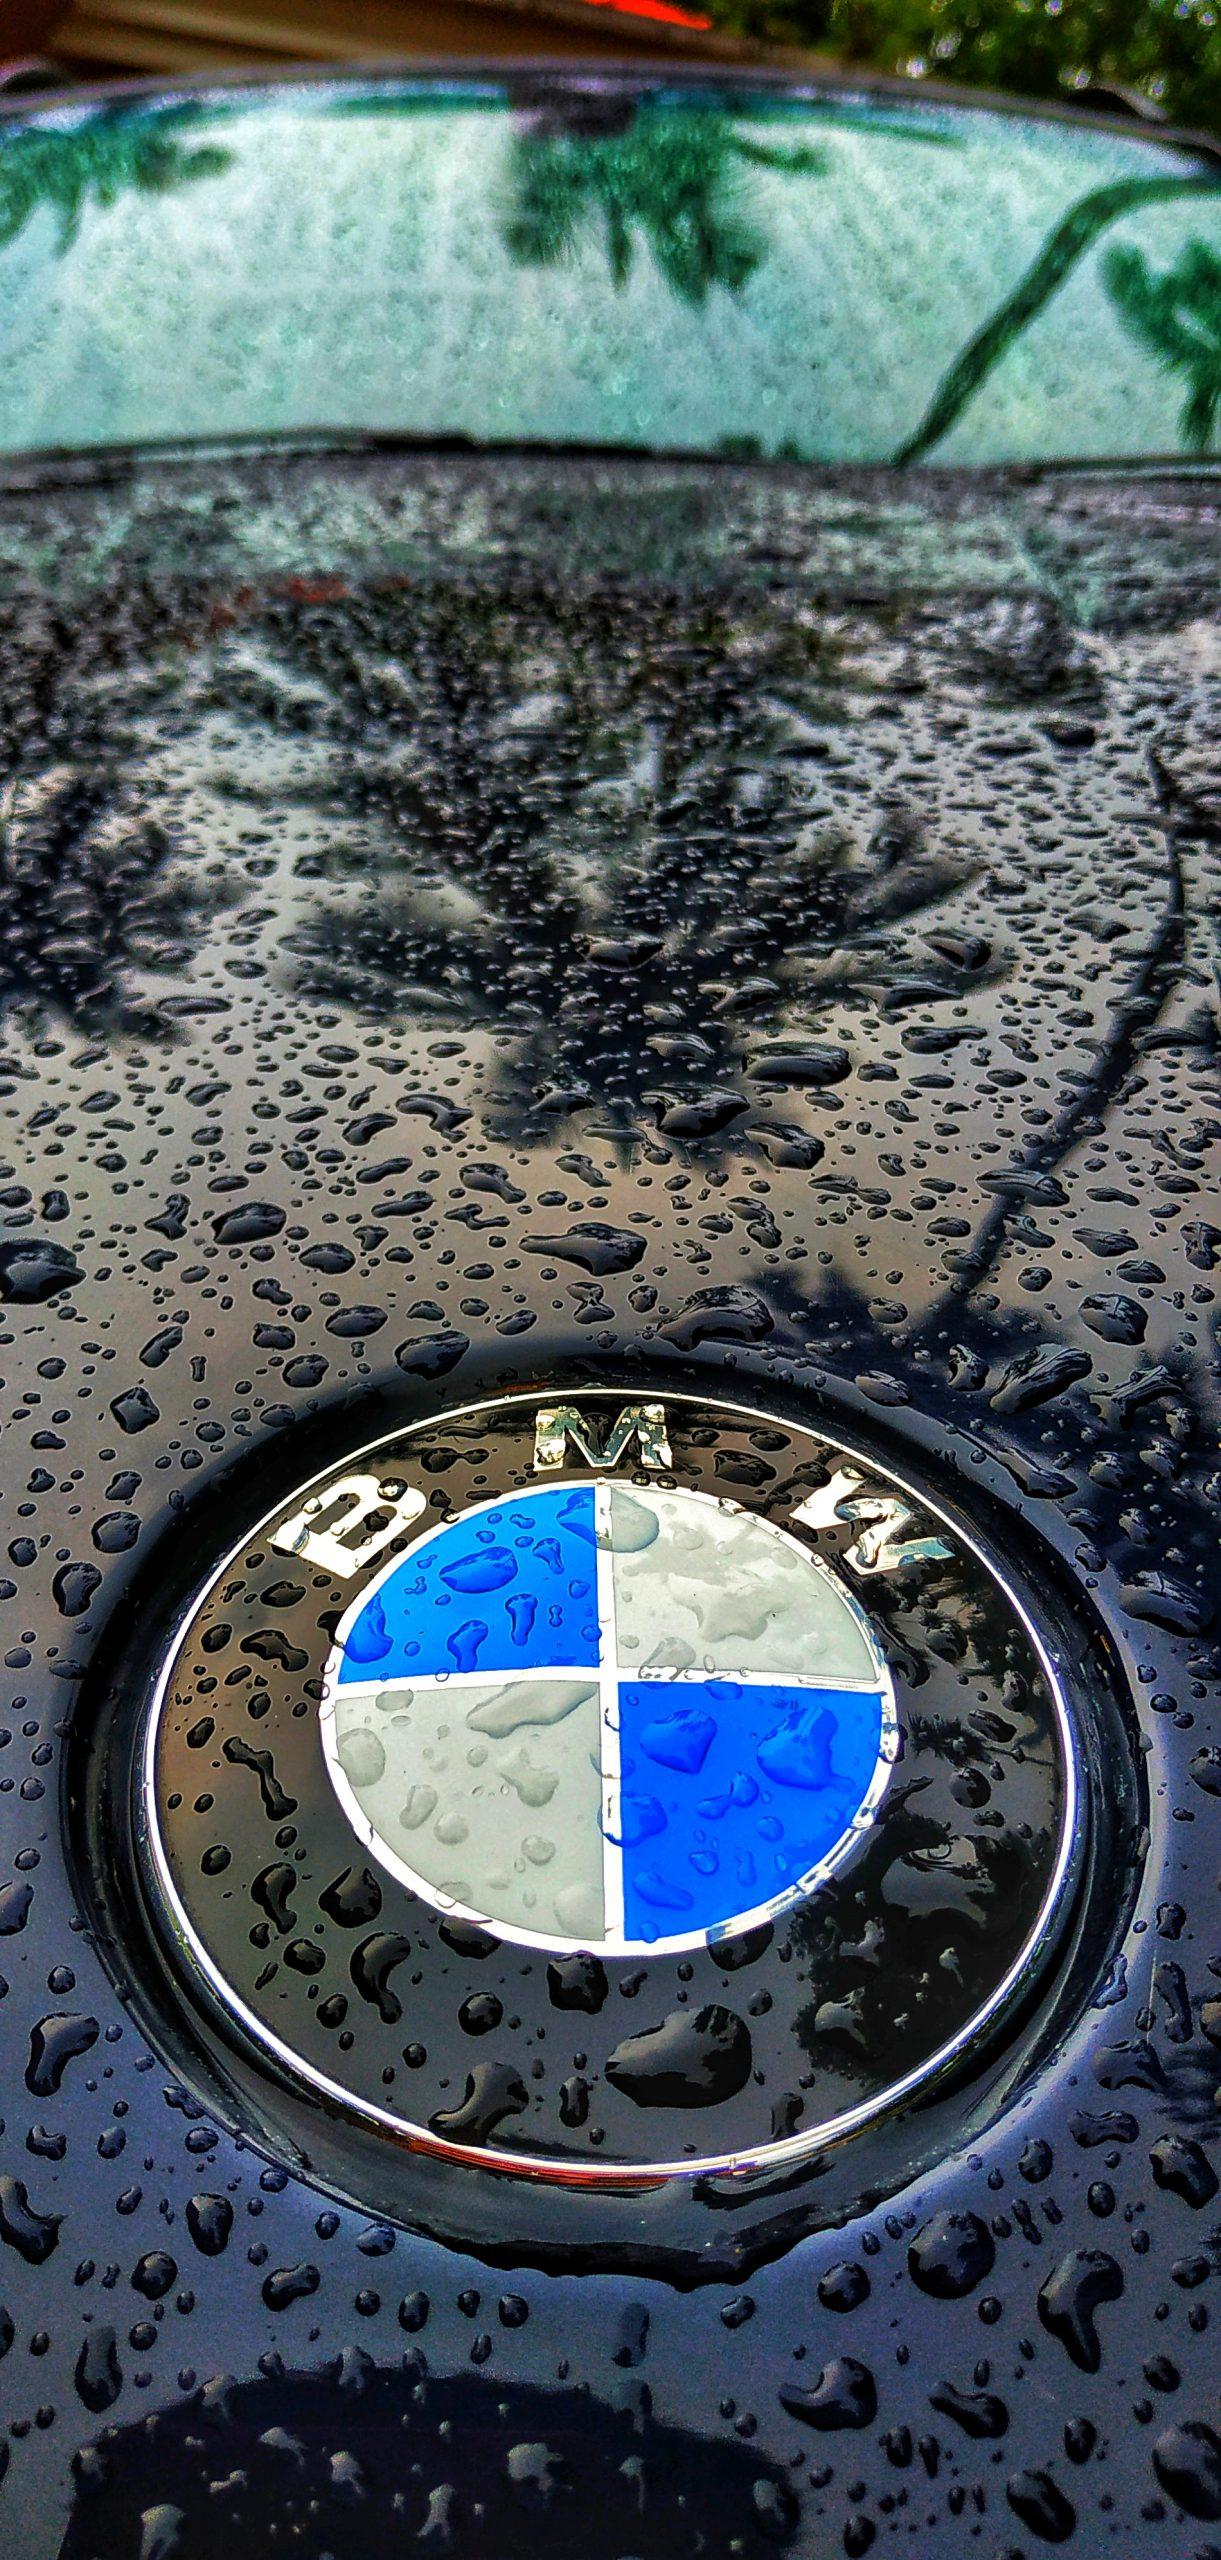 BMW Car in the Rain